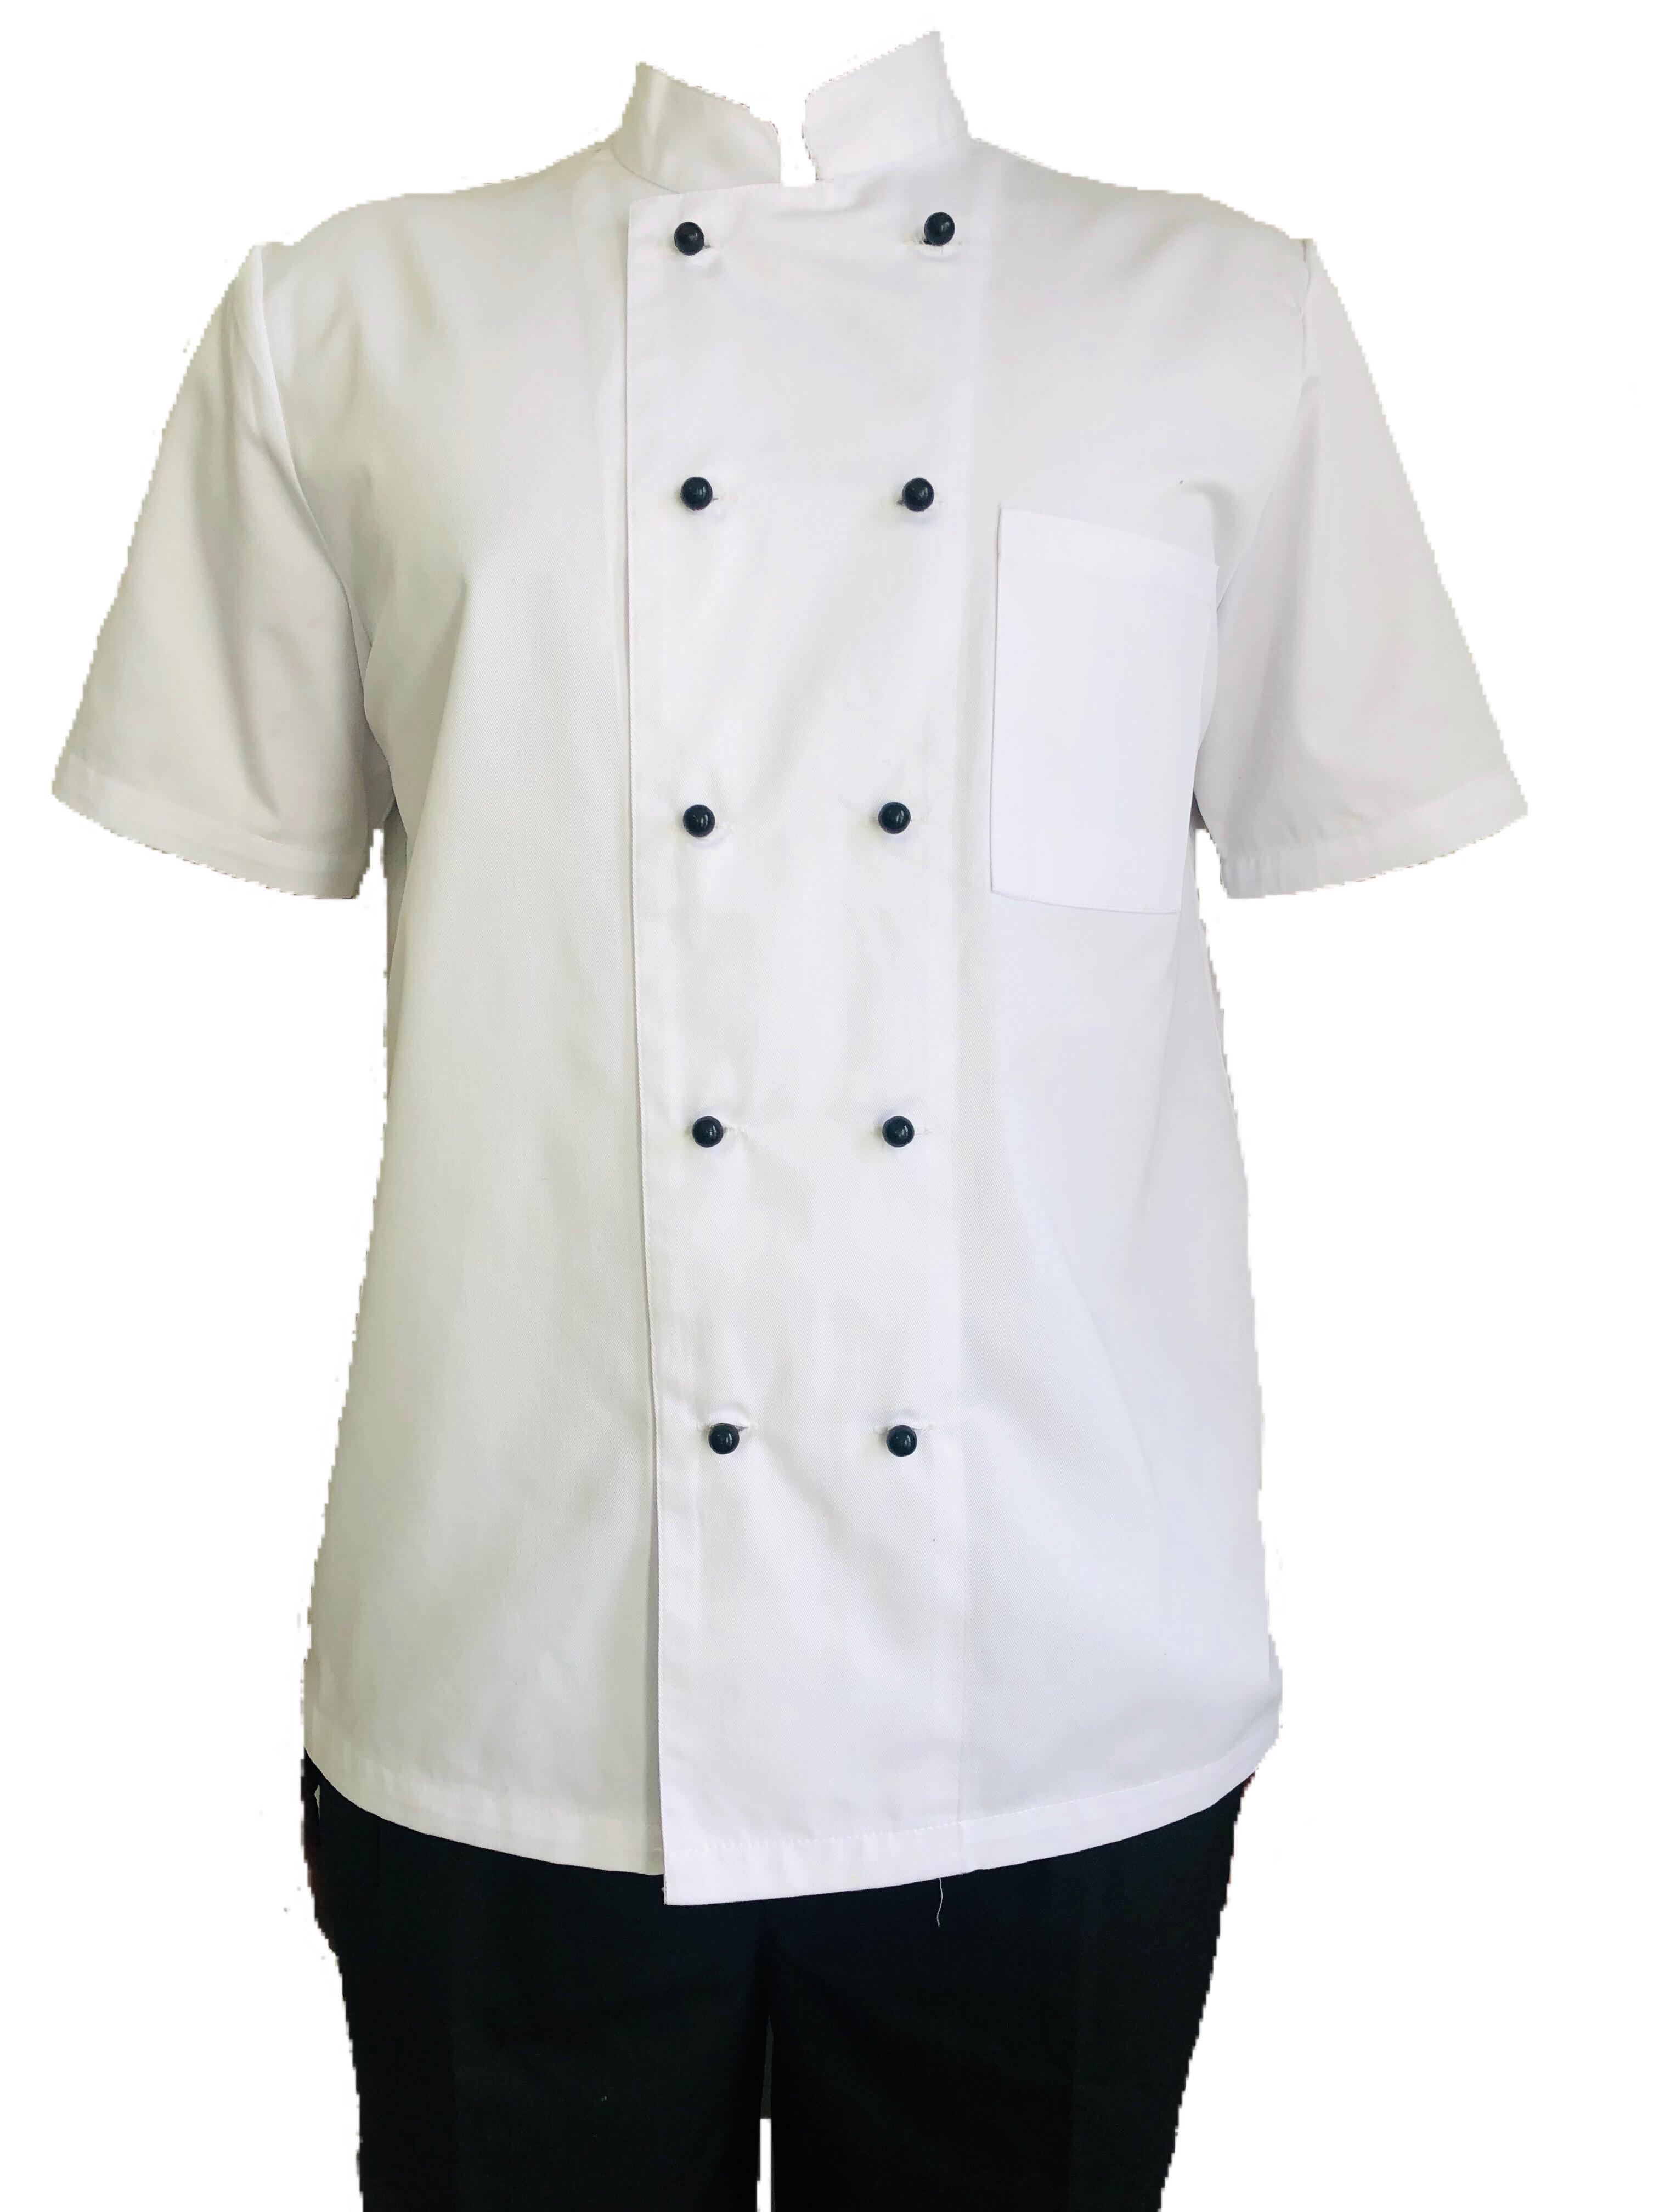 White Chef Jackets